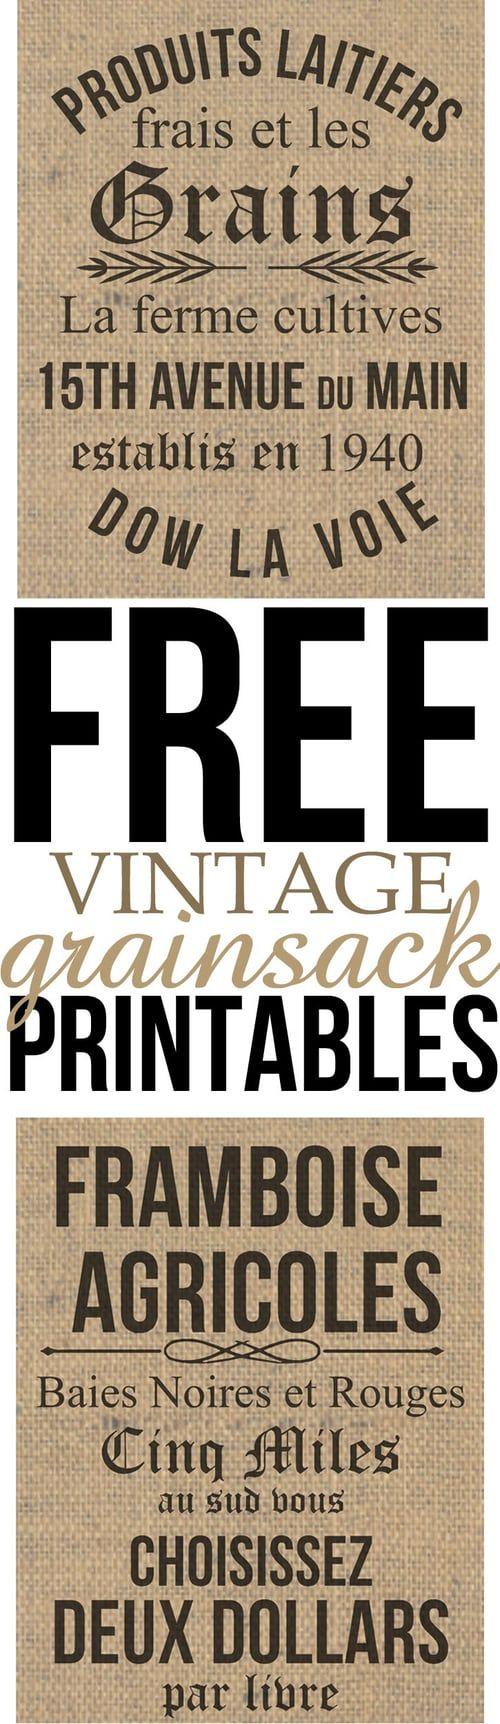 Free Vintage Grainsack Printables.jpg